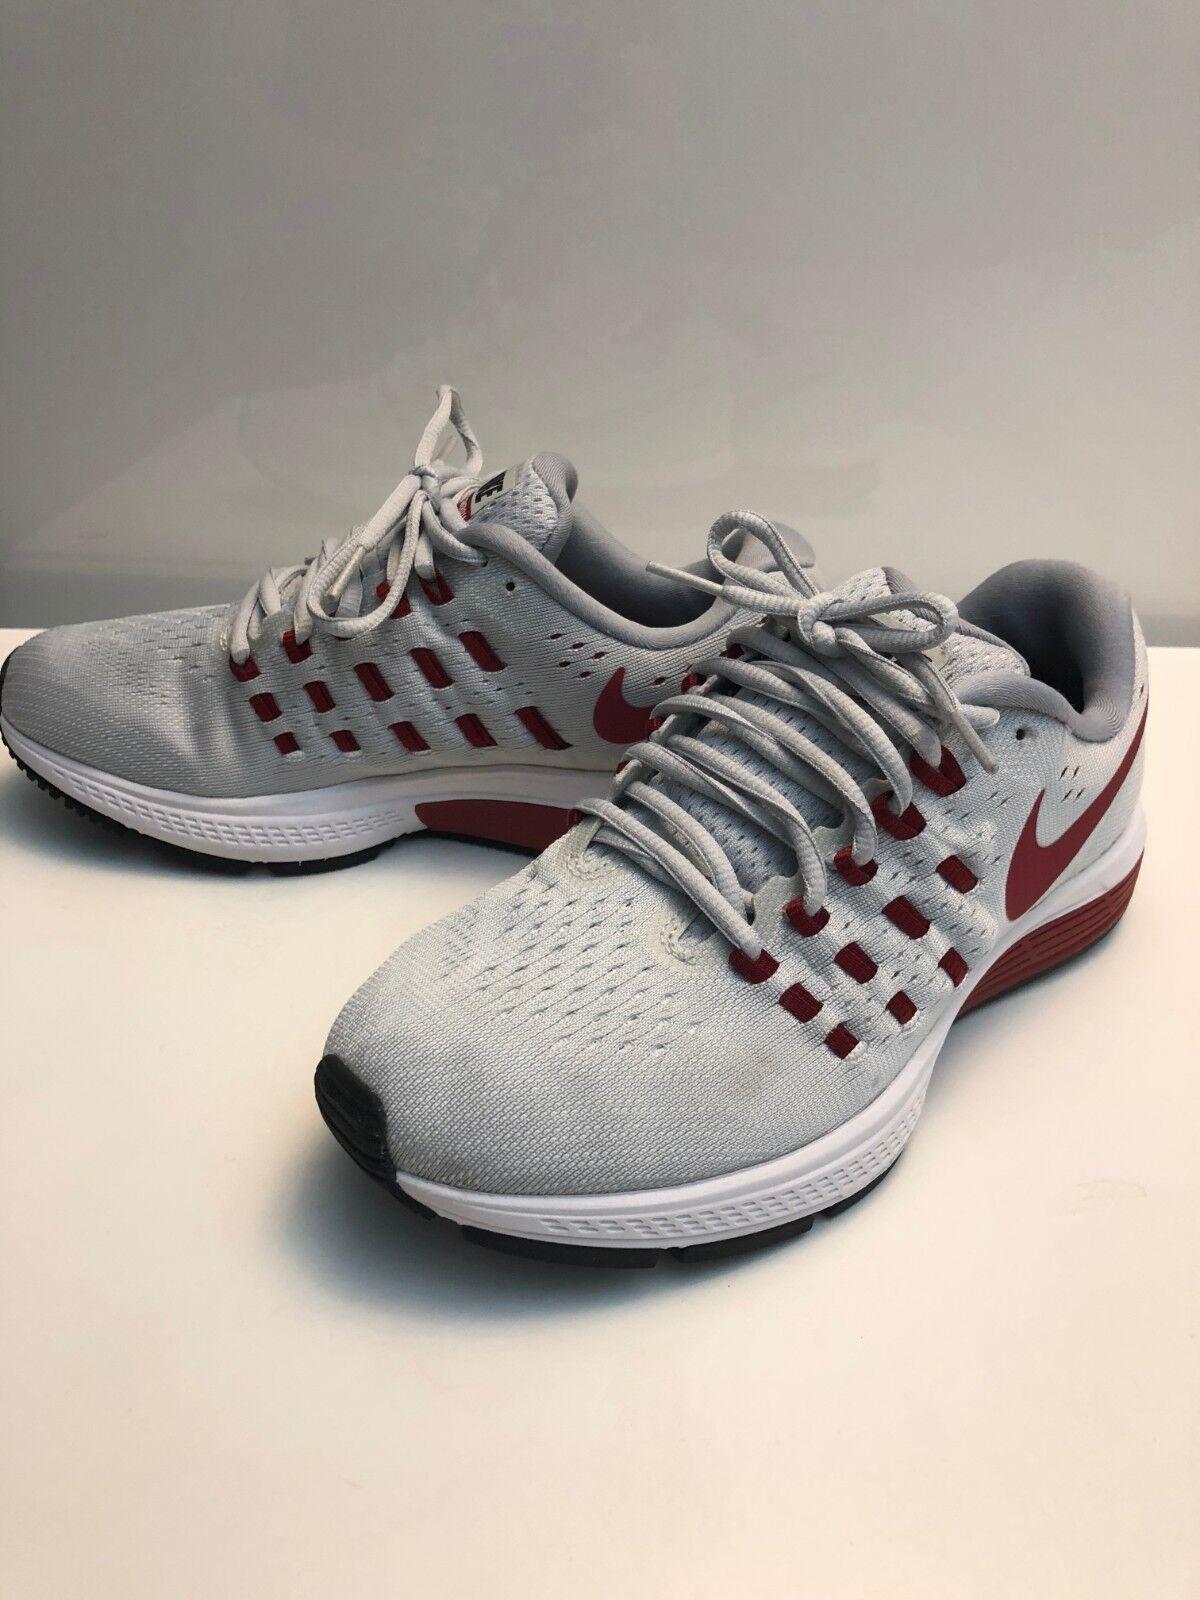 Nike scarpe air zoom vomero 11 Nike 818100 405 le scarpe Nike 11 da corsa sz   c9d4fe